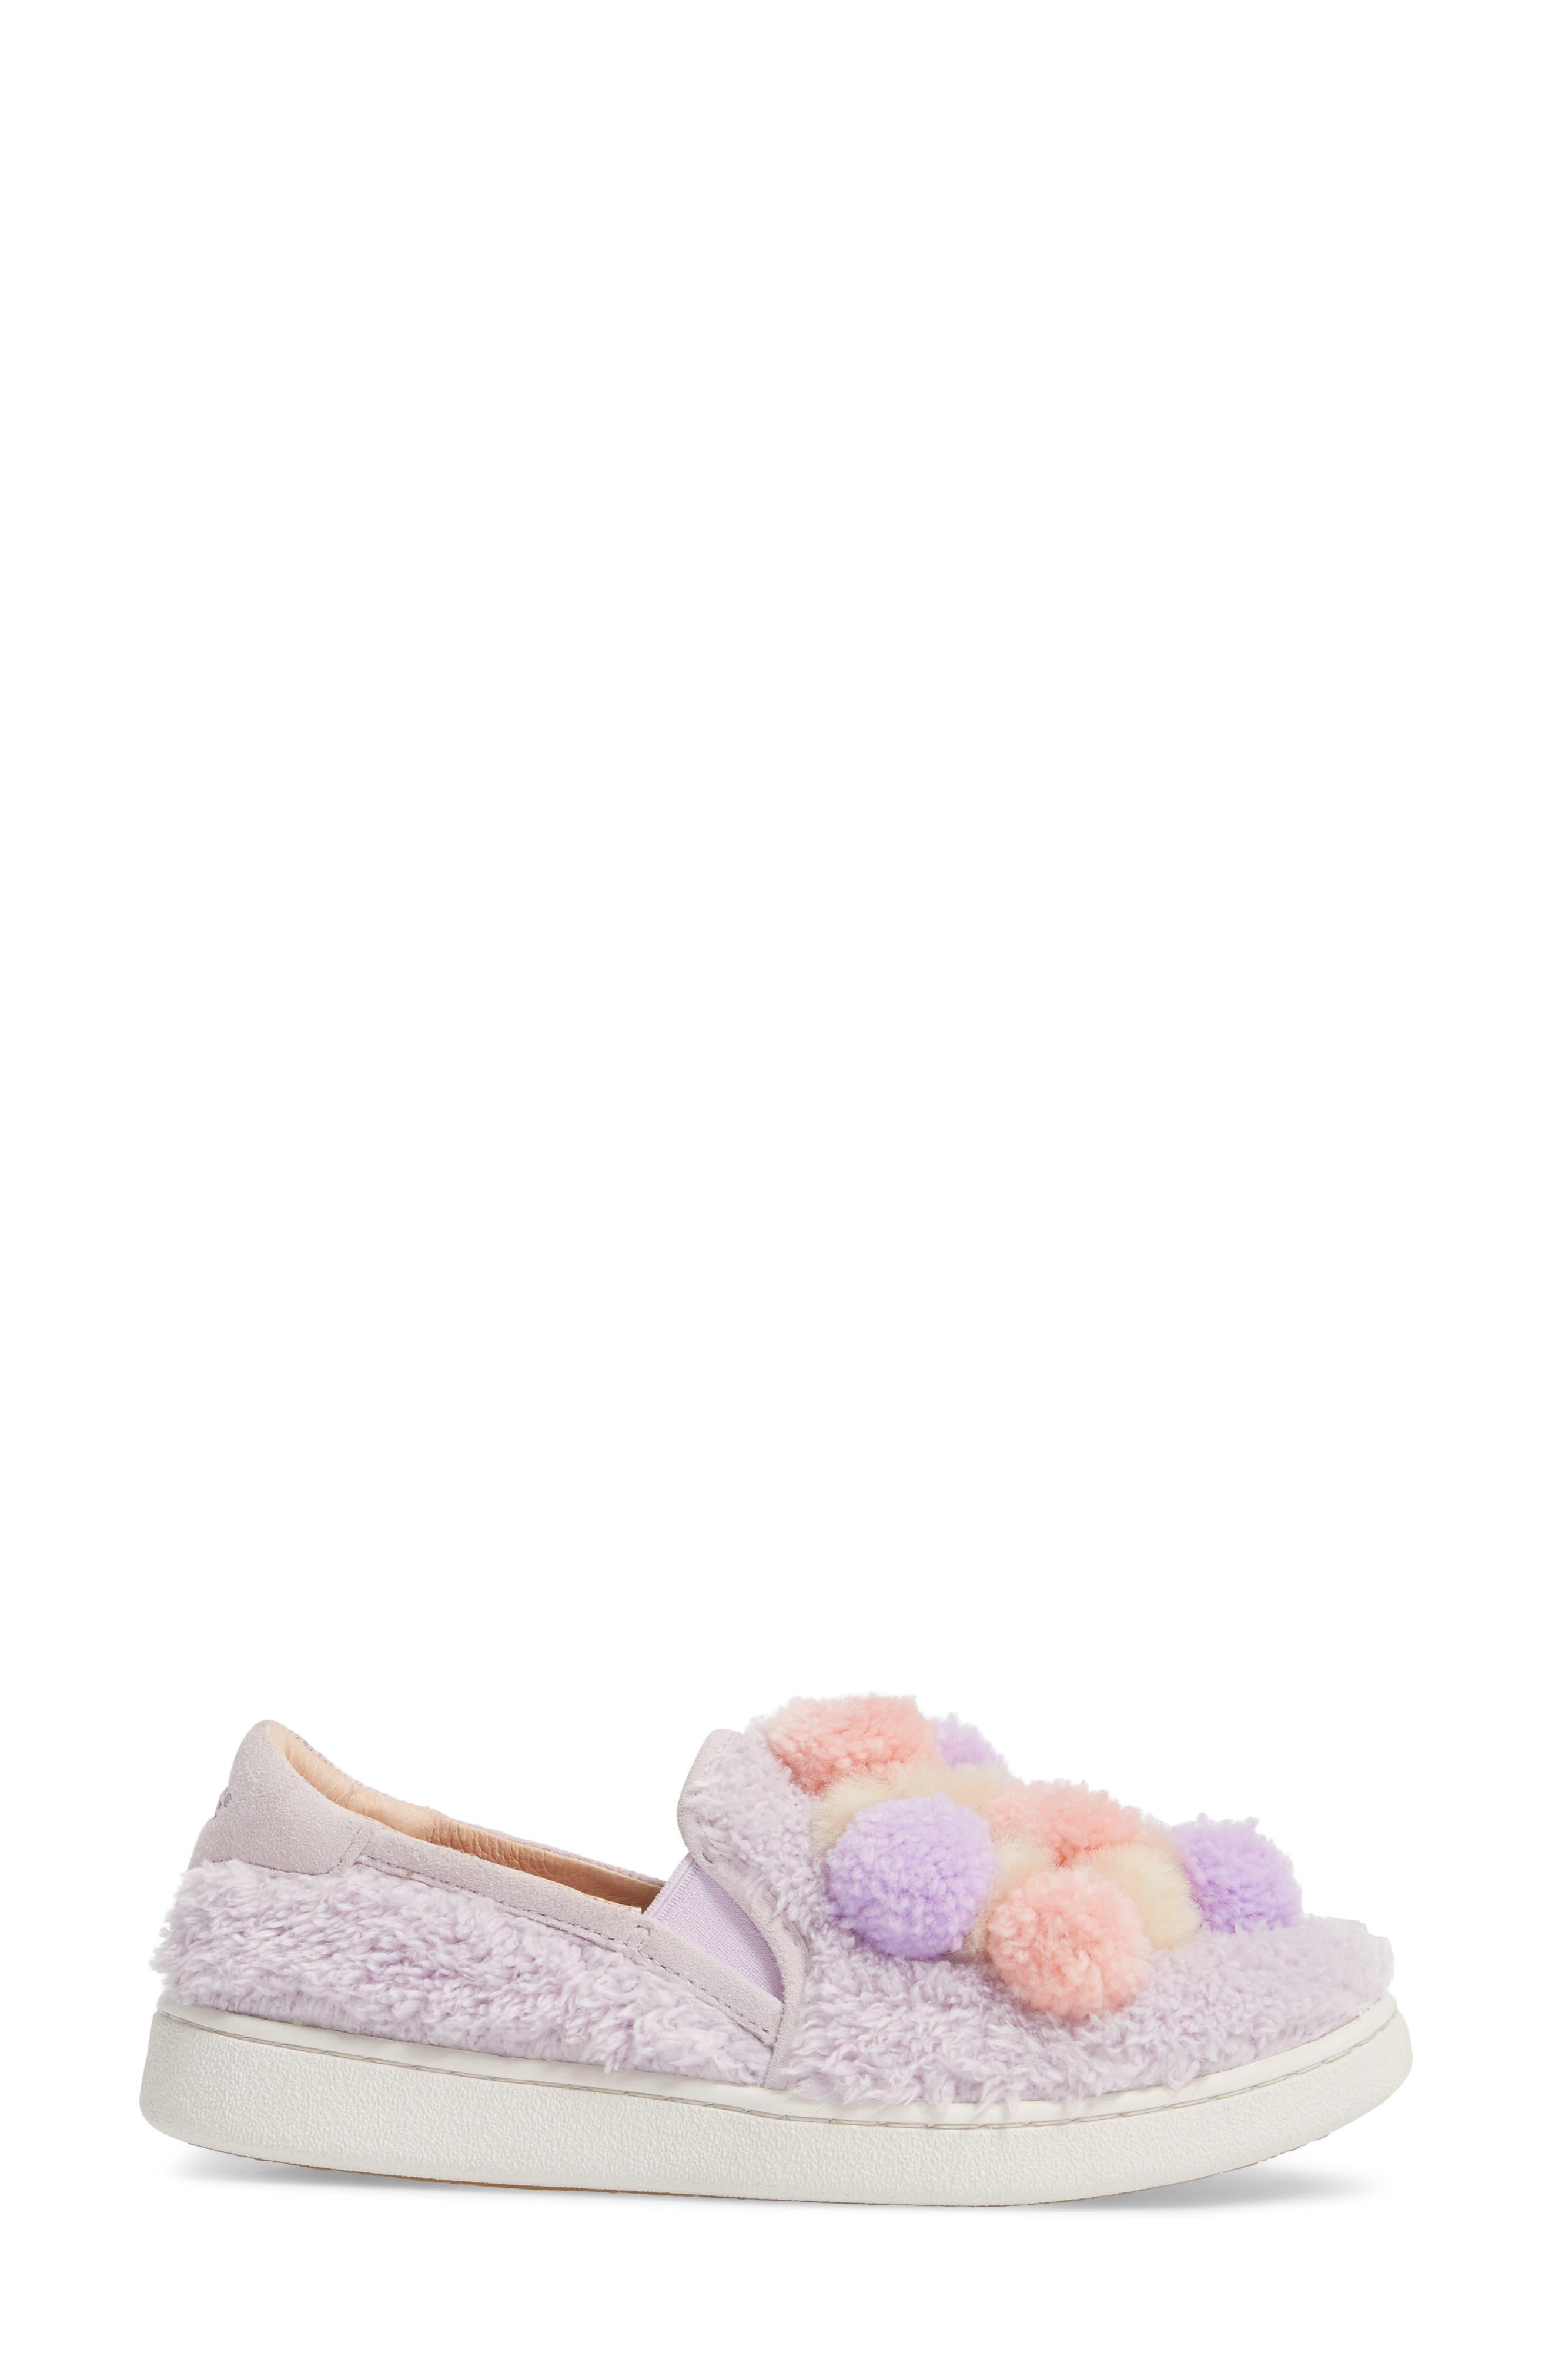 Alternate Image 3  - UGG® Ricci Plush Genuine Shearling Pompom Slip-On Sneaker (Women)